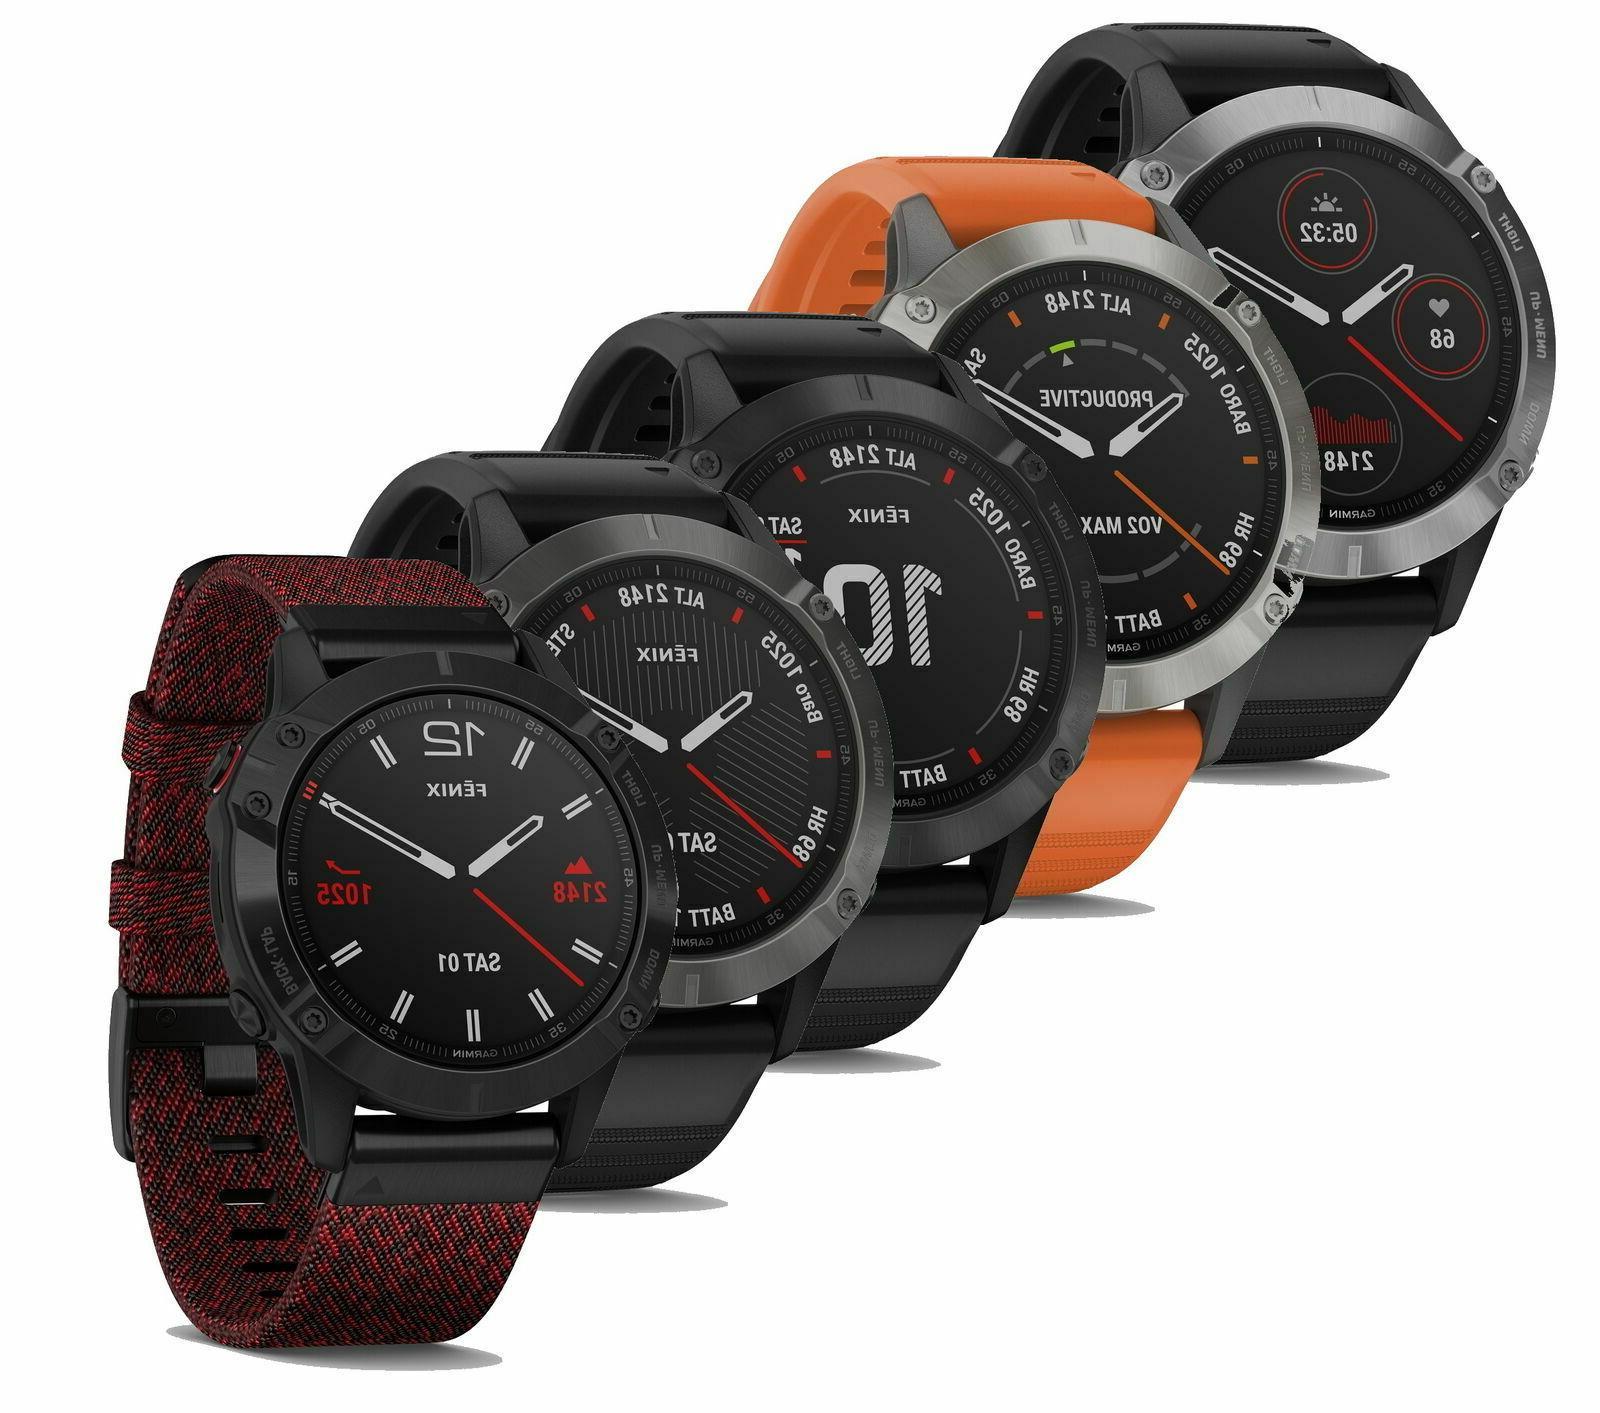 Garmin Fenix 6 GPS PRO or Premium edition